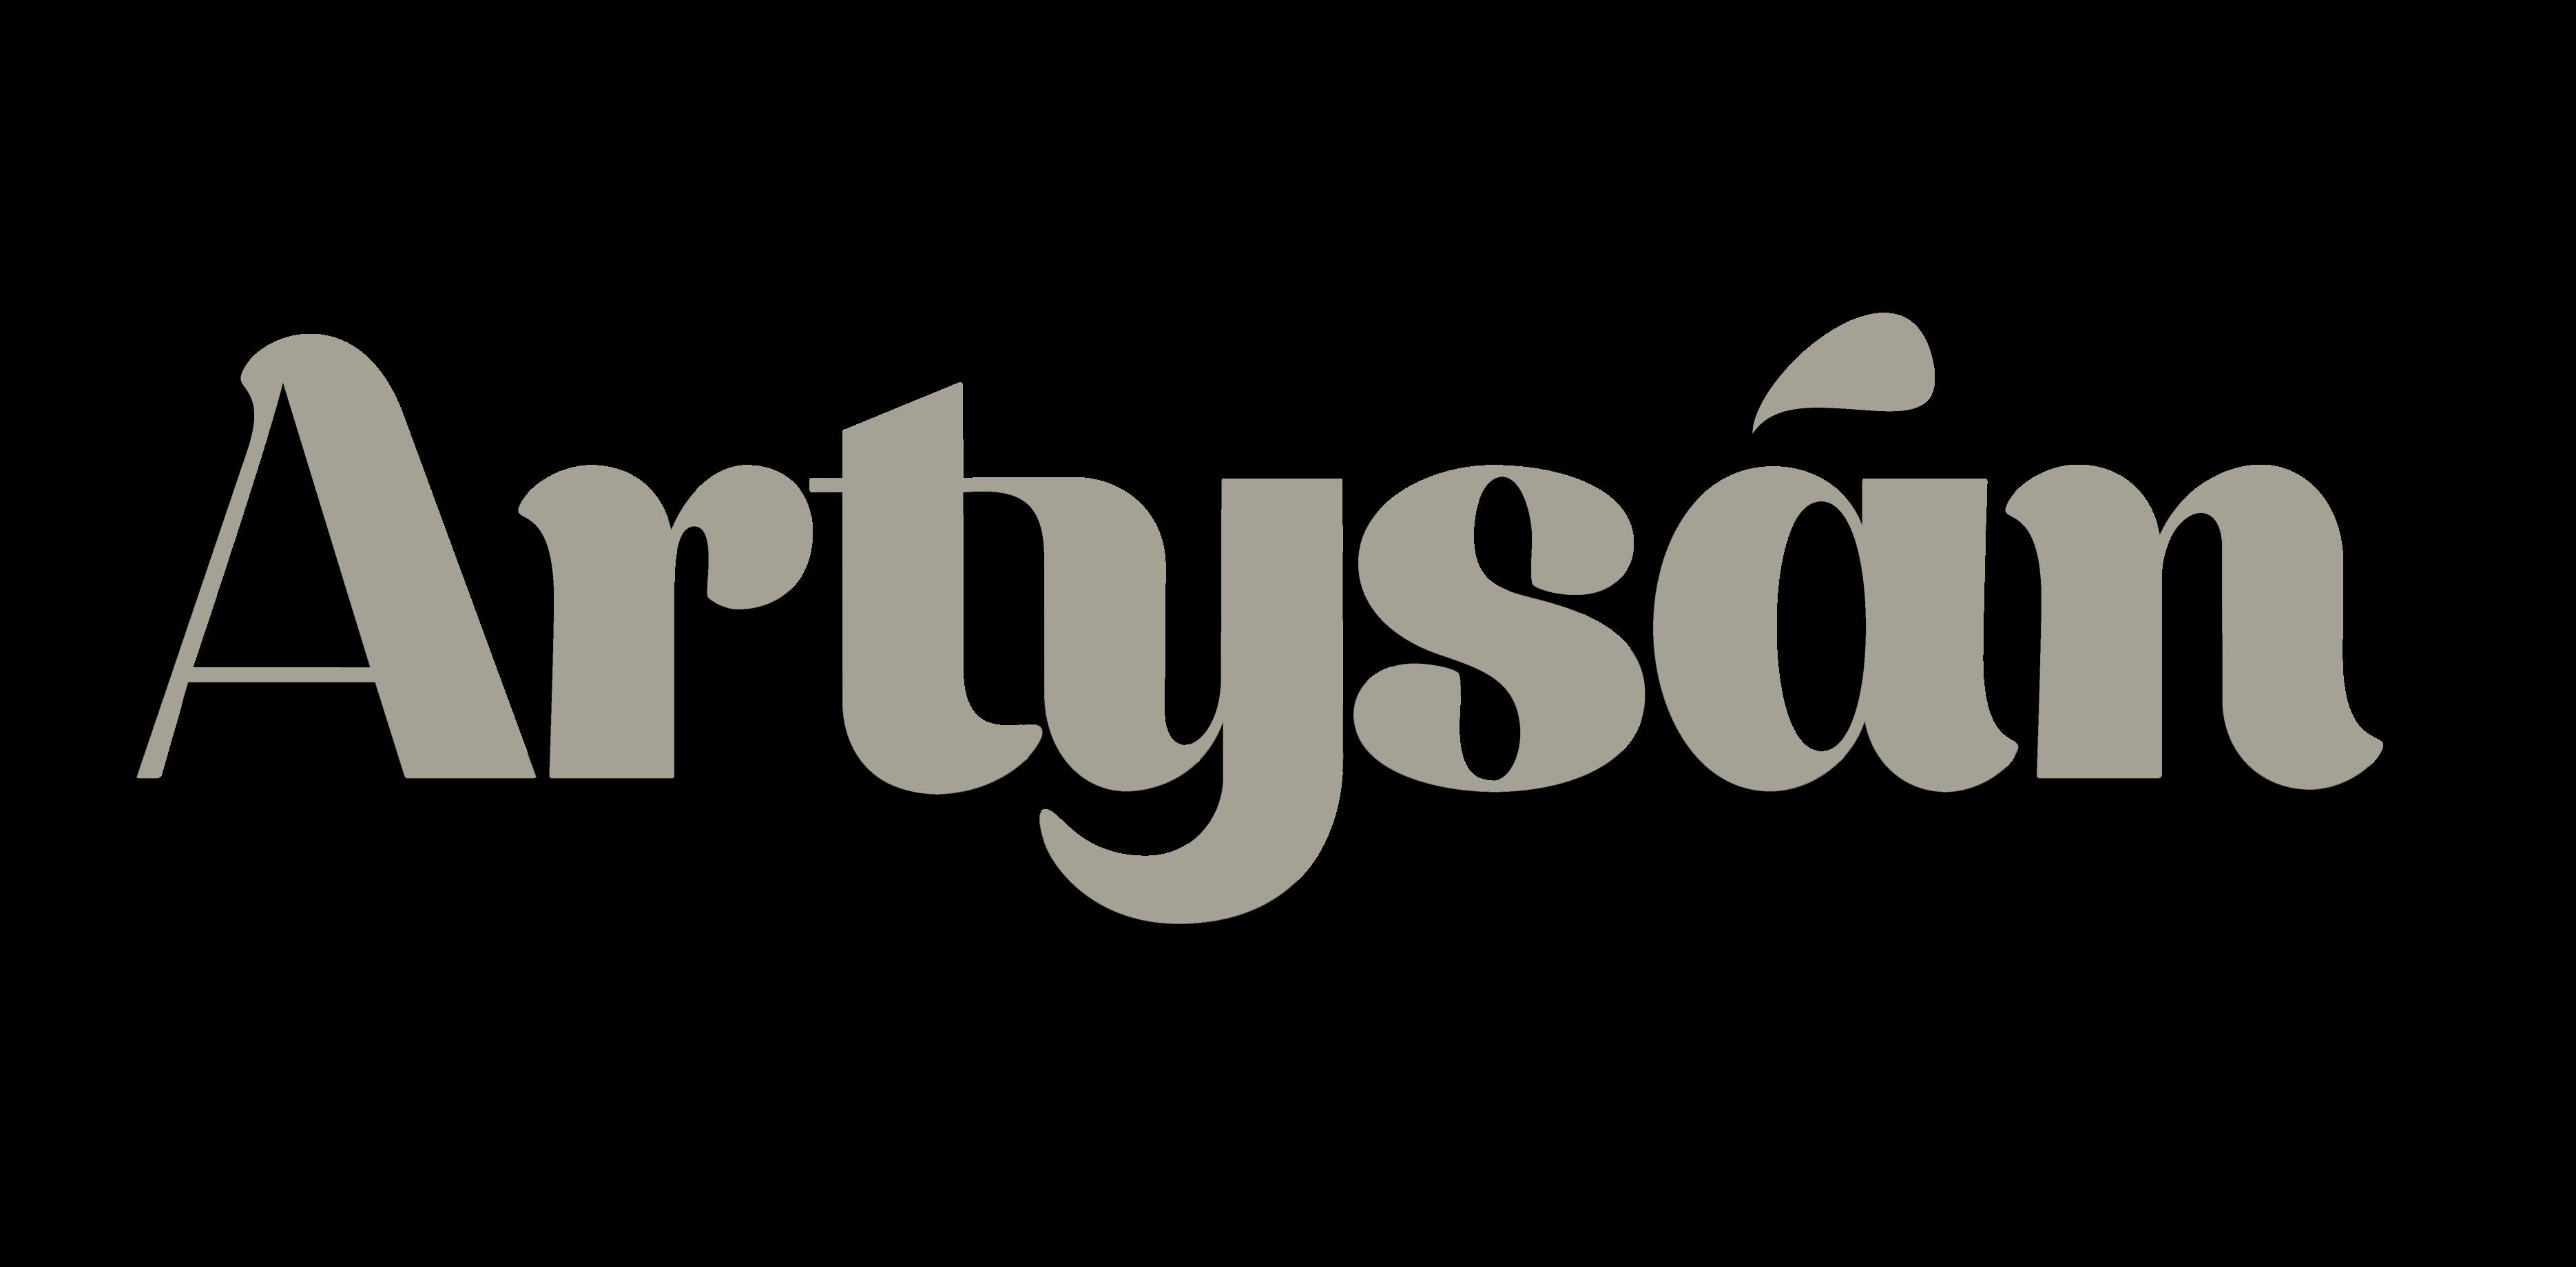 New york logo